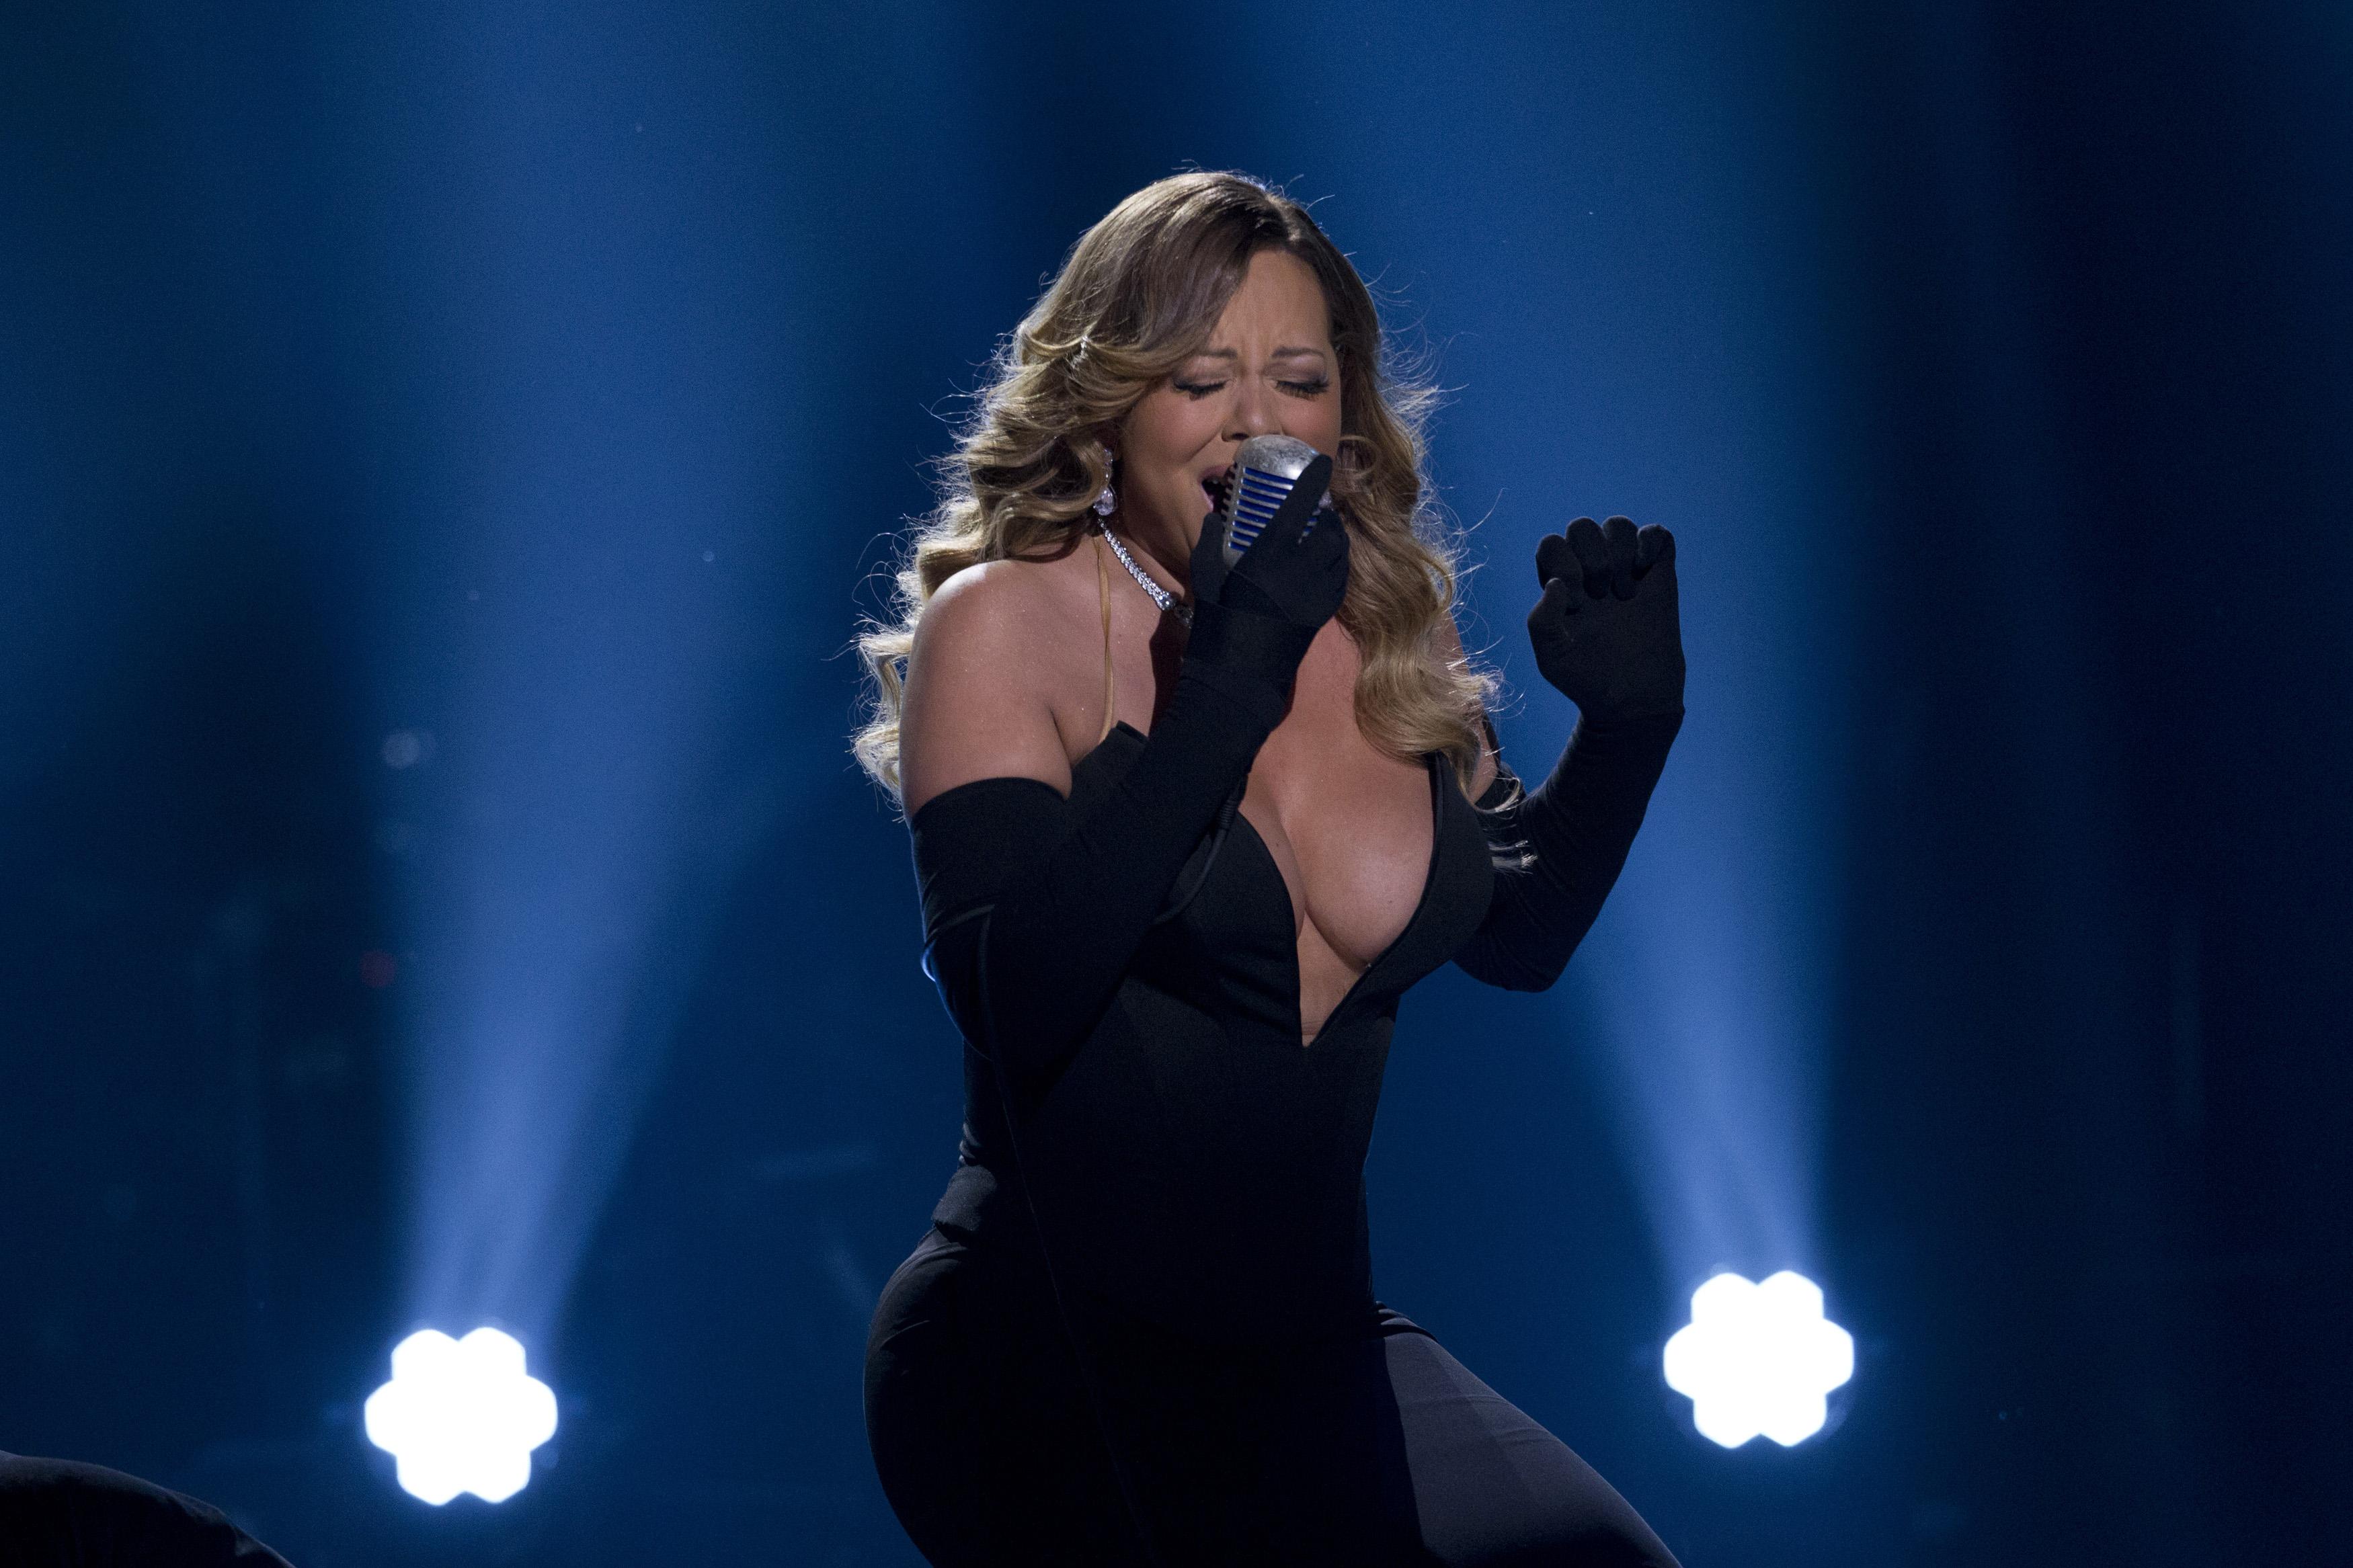 Mariah Carey Cleavage: 12 Instagram Photos That Show Off Her ... Mariah Carey